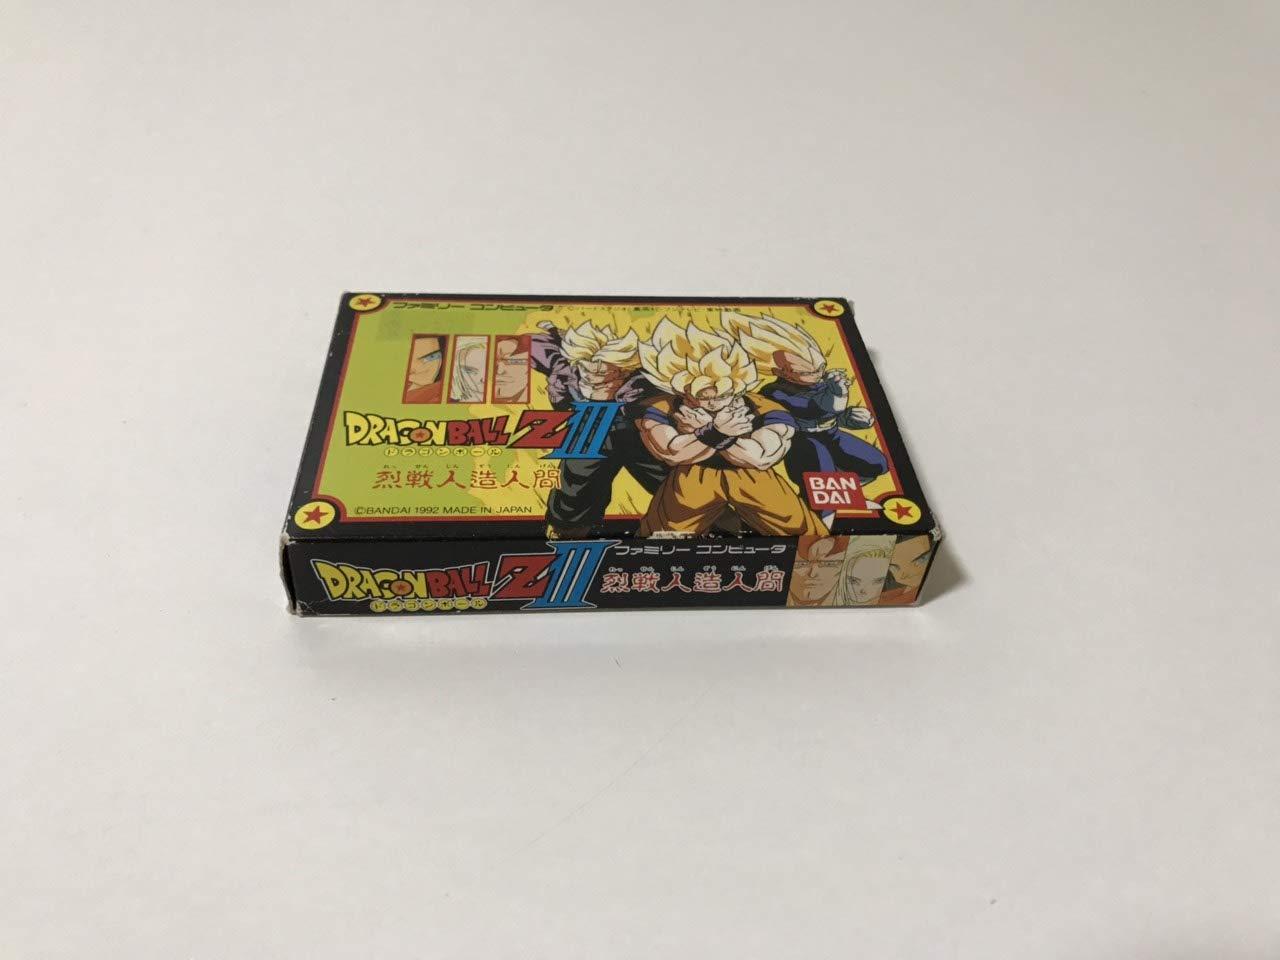 Dragon Ball Z III favorite Special sale item Ressen Japanese Import Famicom Ningen Jinzou